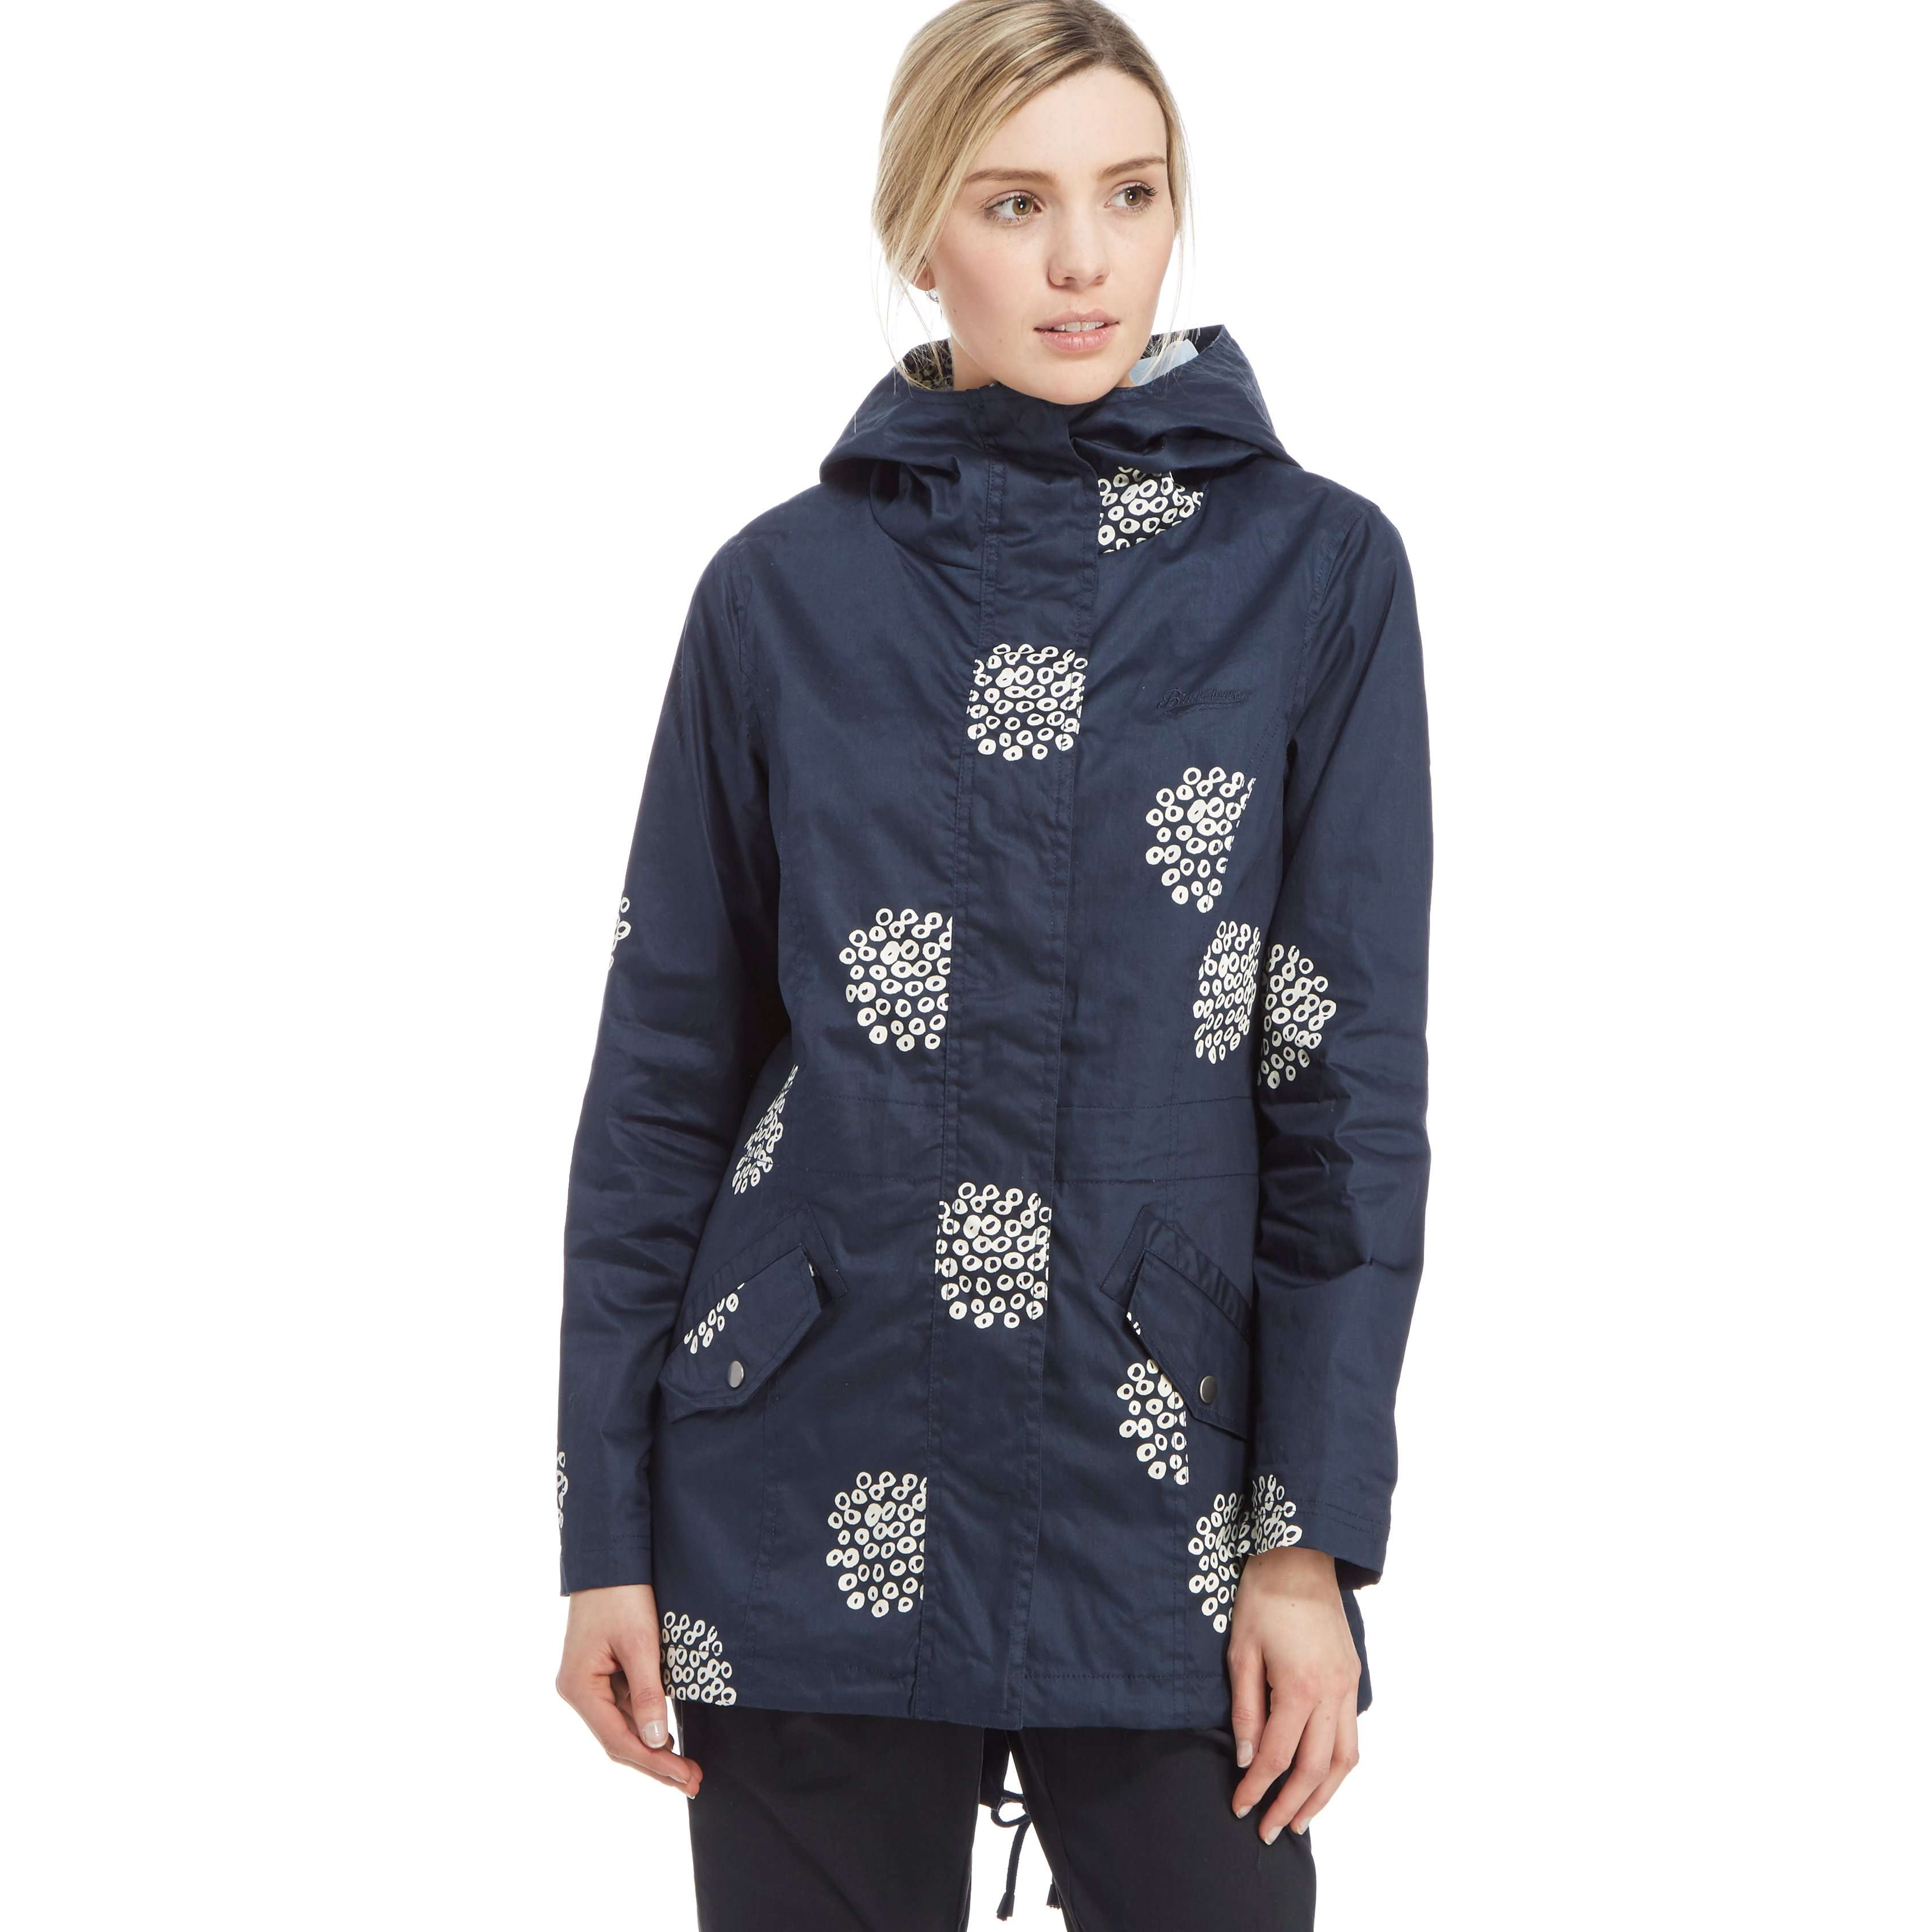 BRAKEBURN Women's Printed Parka Jacket